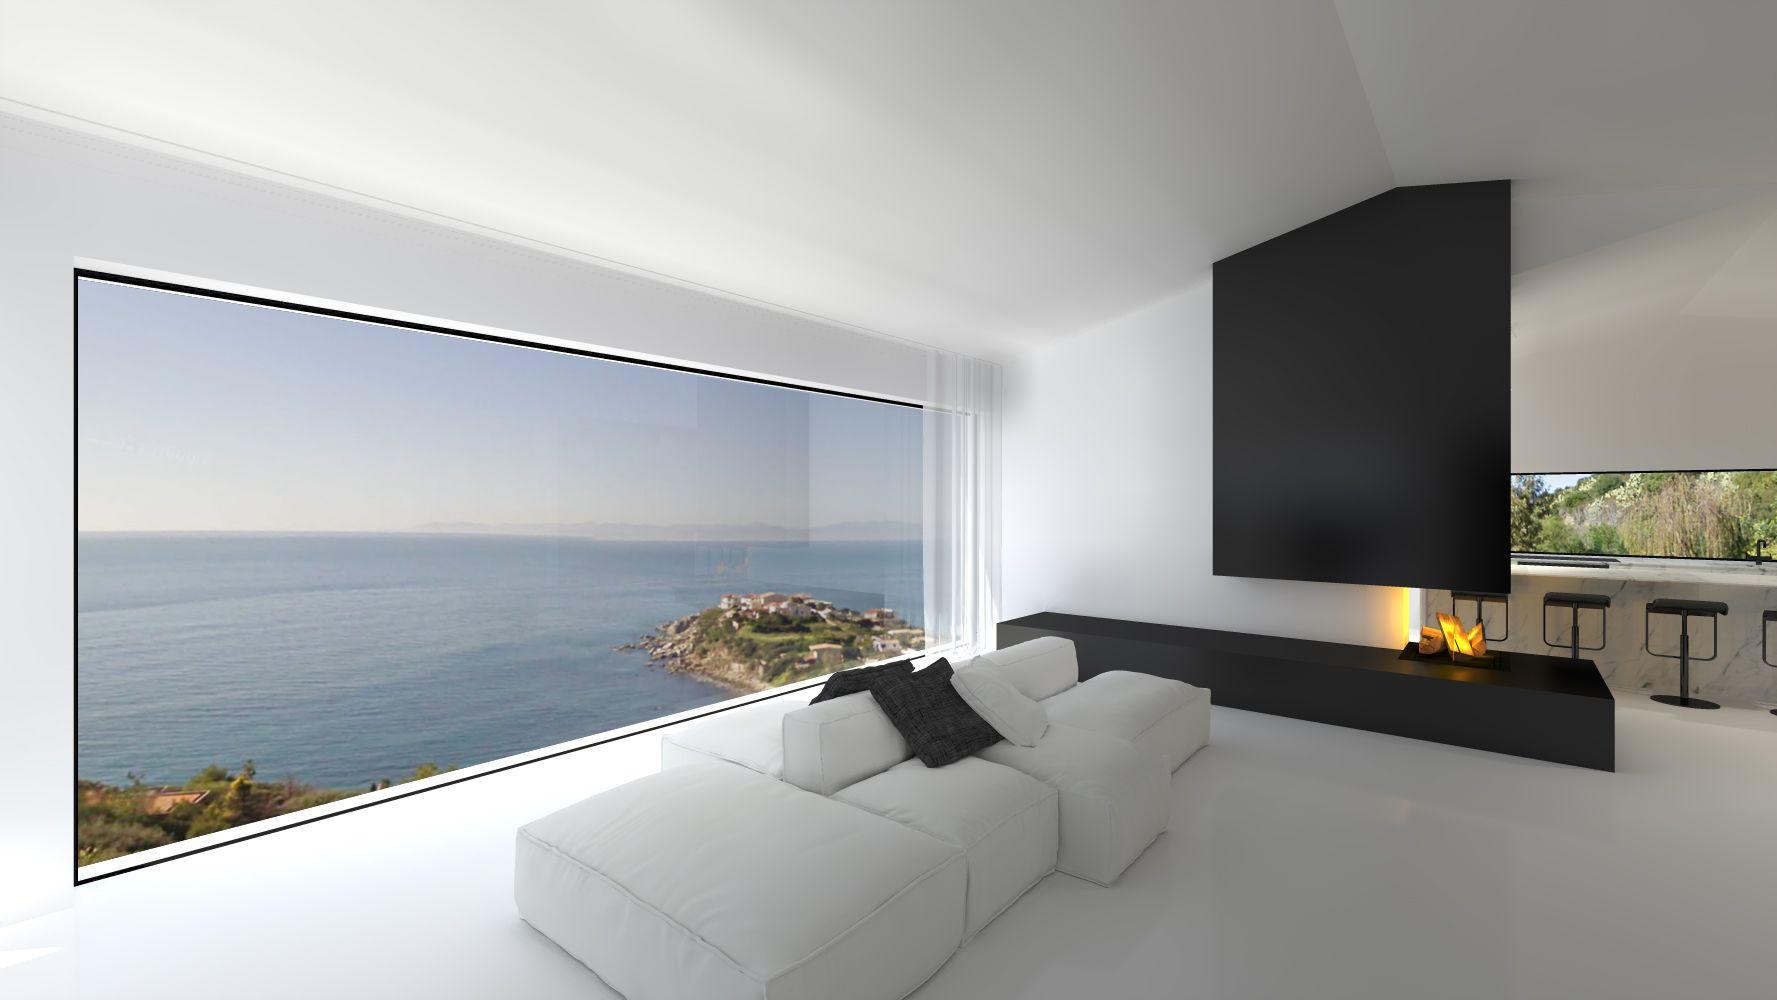 Imore Interieurarchitectuur Project Casa Perla Design Luxury Real Estate Architecture Og double d living luxury